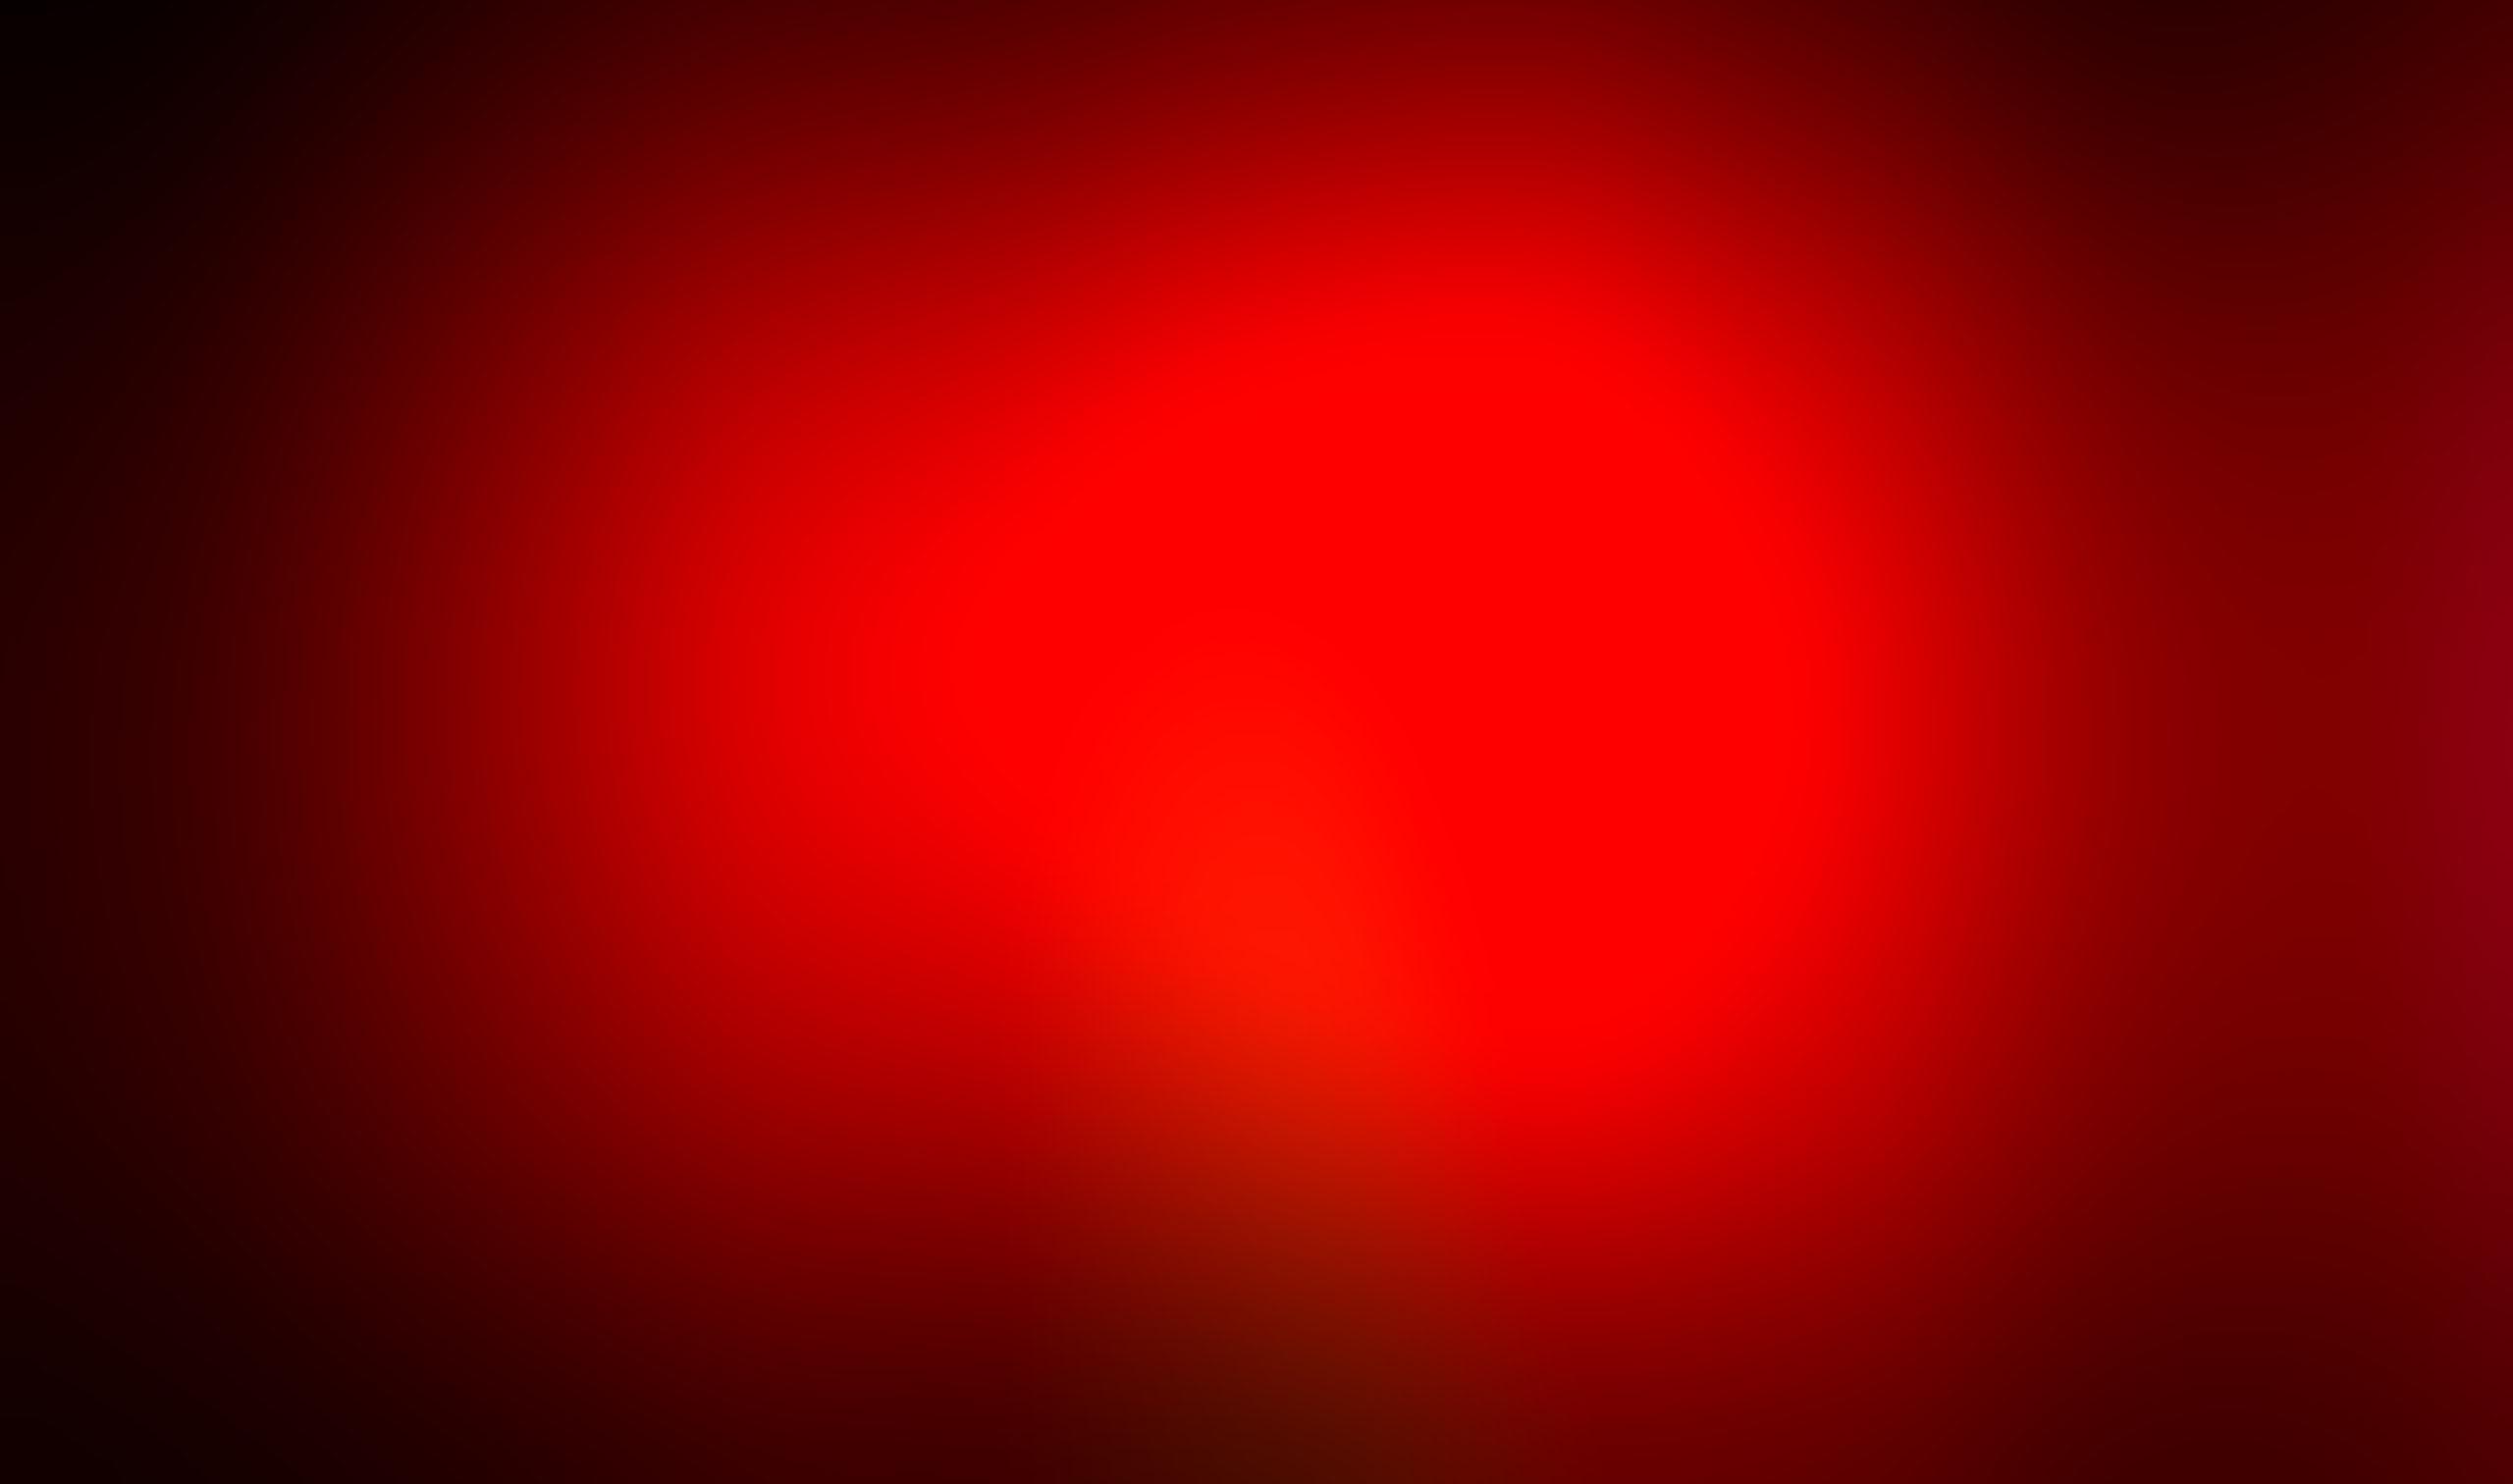 red-wallpaper-hd-1080p – Smederevske novine